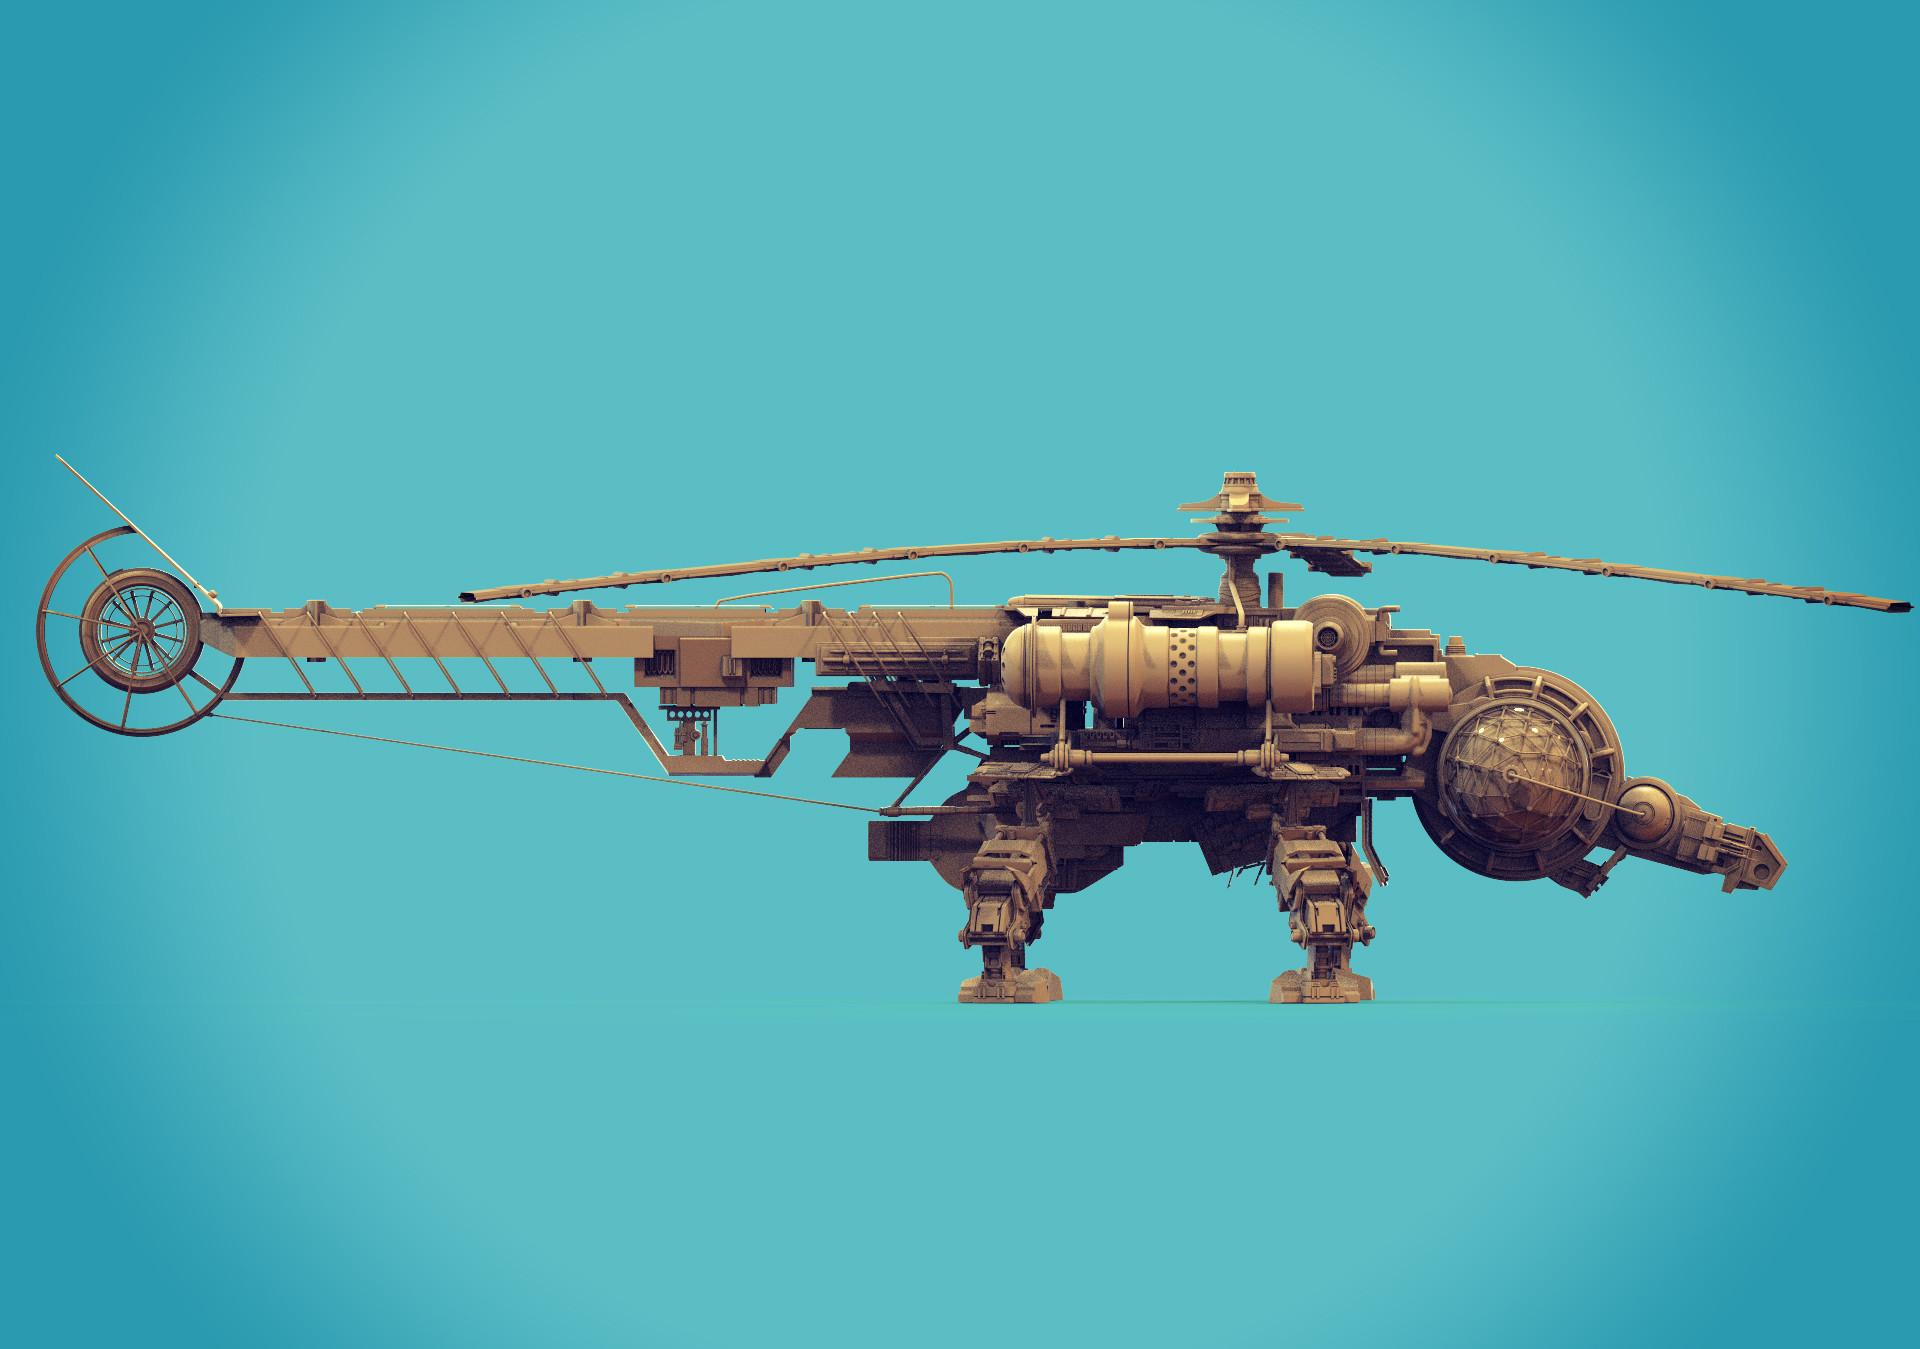 Ben nicholas bughelicopter 03